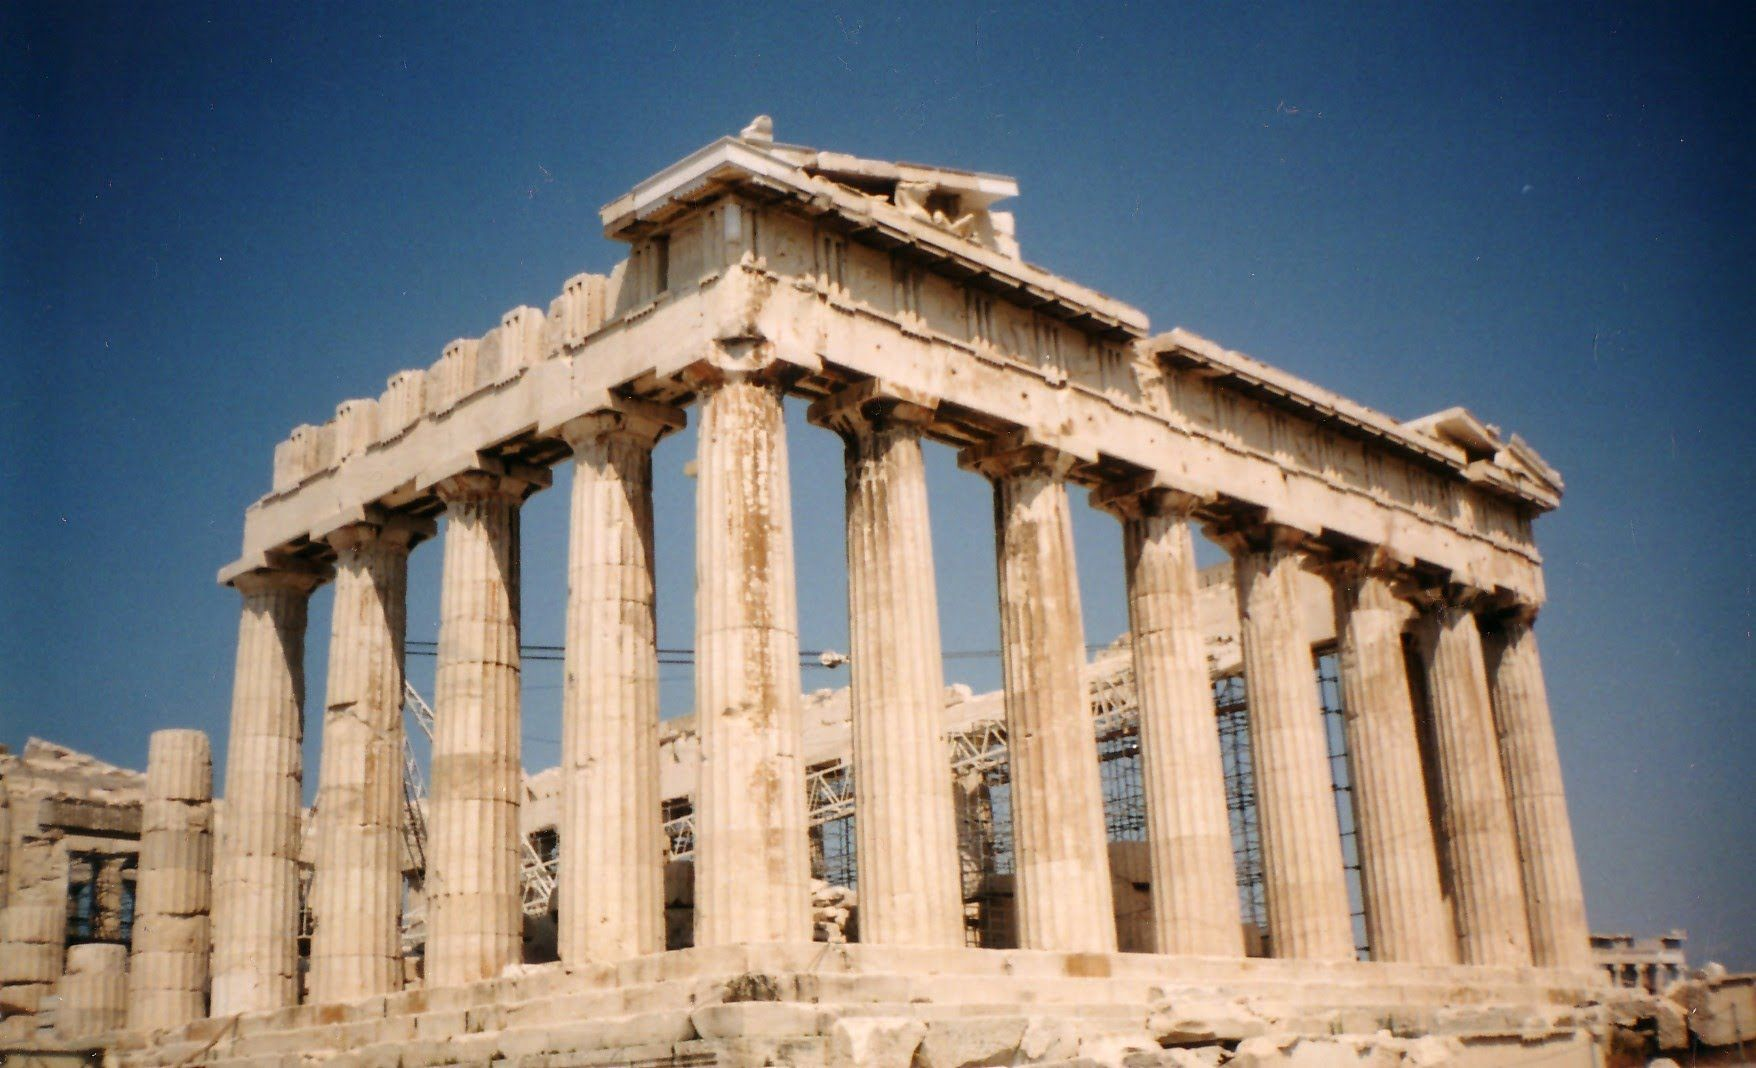 La construcci n de un imperio grecia grecia cultura for Cultura de la antigua grecia